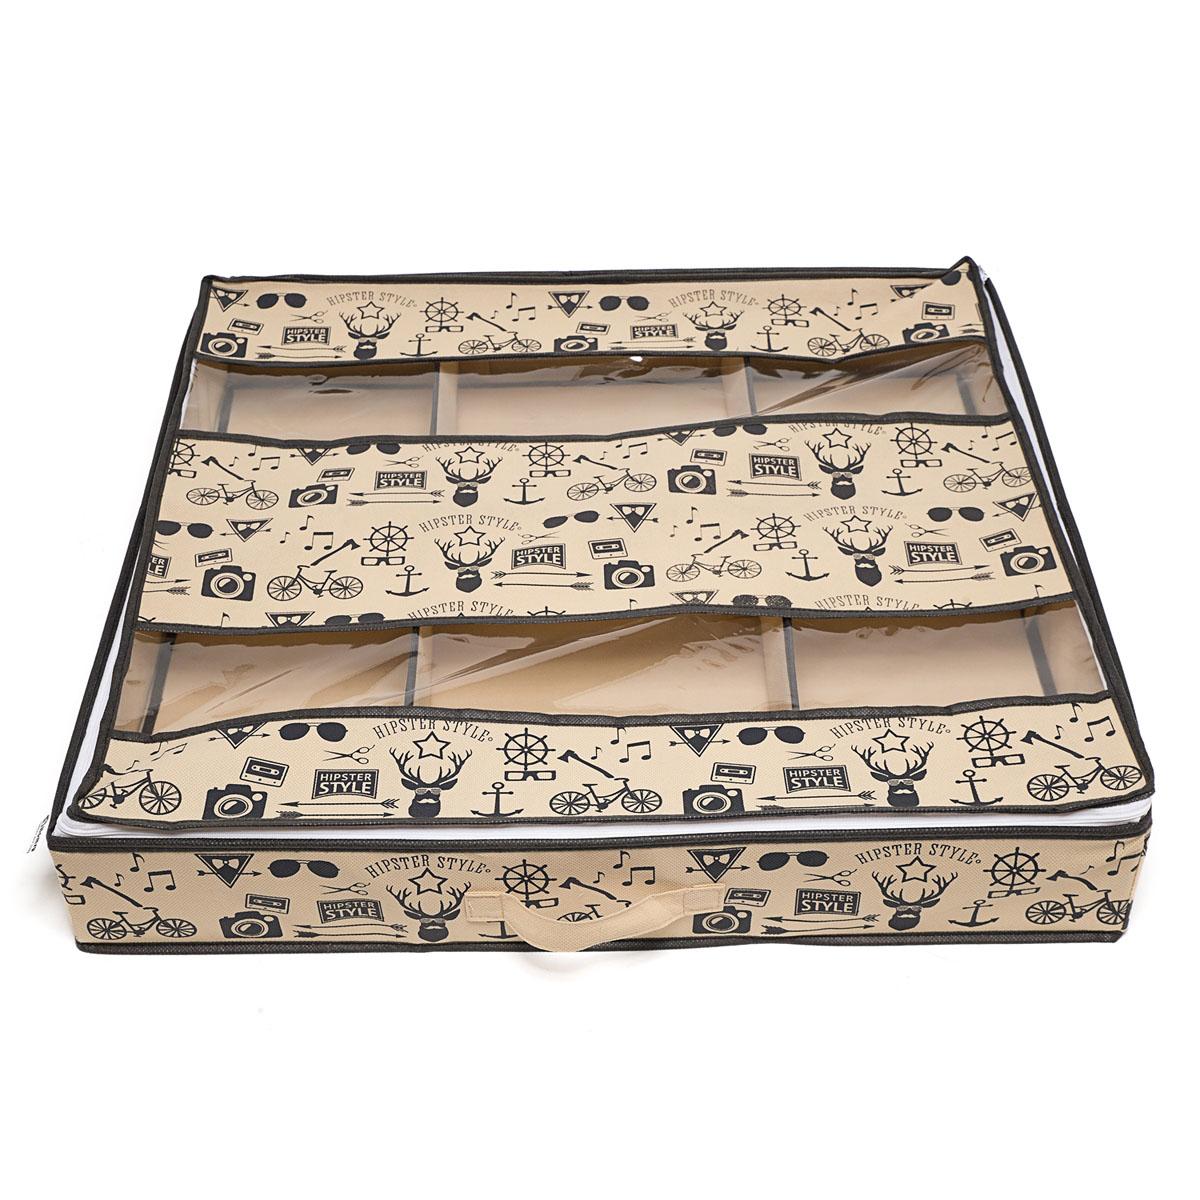 Органайзер для хранения обуви Hipster Style, 6 секций, 66 х 63 х 11 см органайзер для хранения обуви homsu bora bora 52 х 26 х 12 см